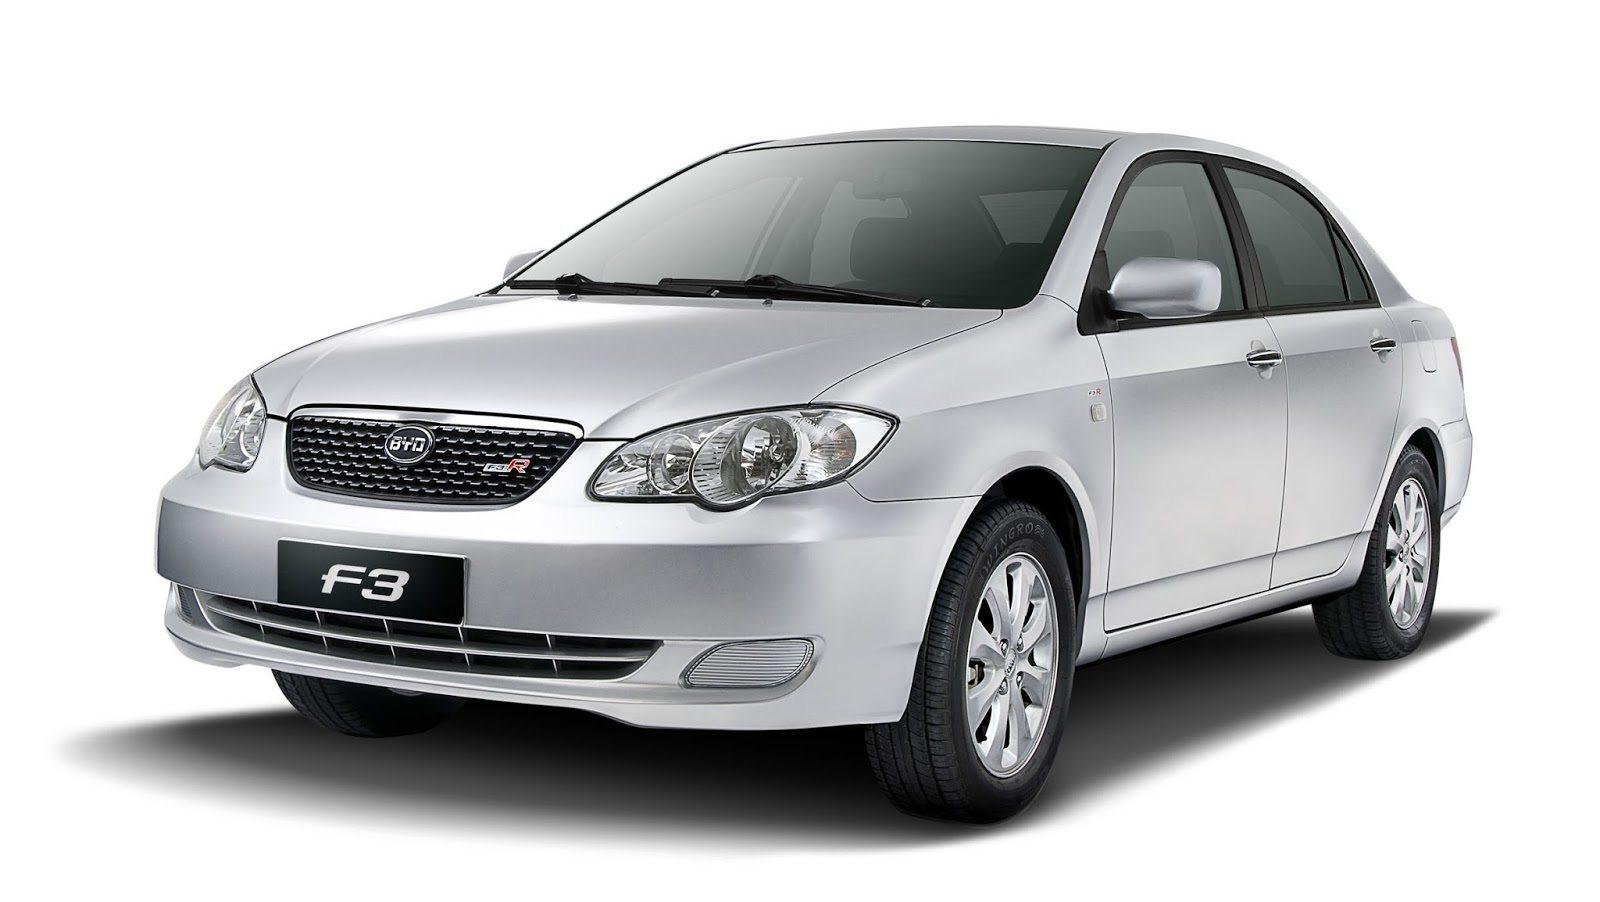 BYD F3 GLXI 2018 carprices